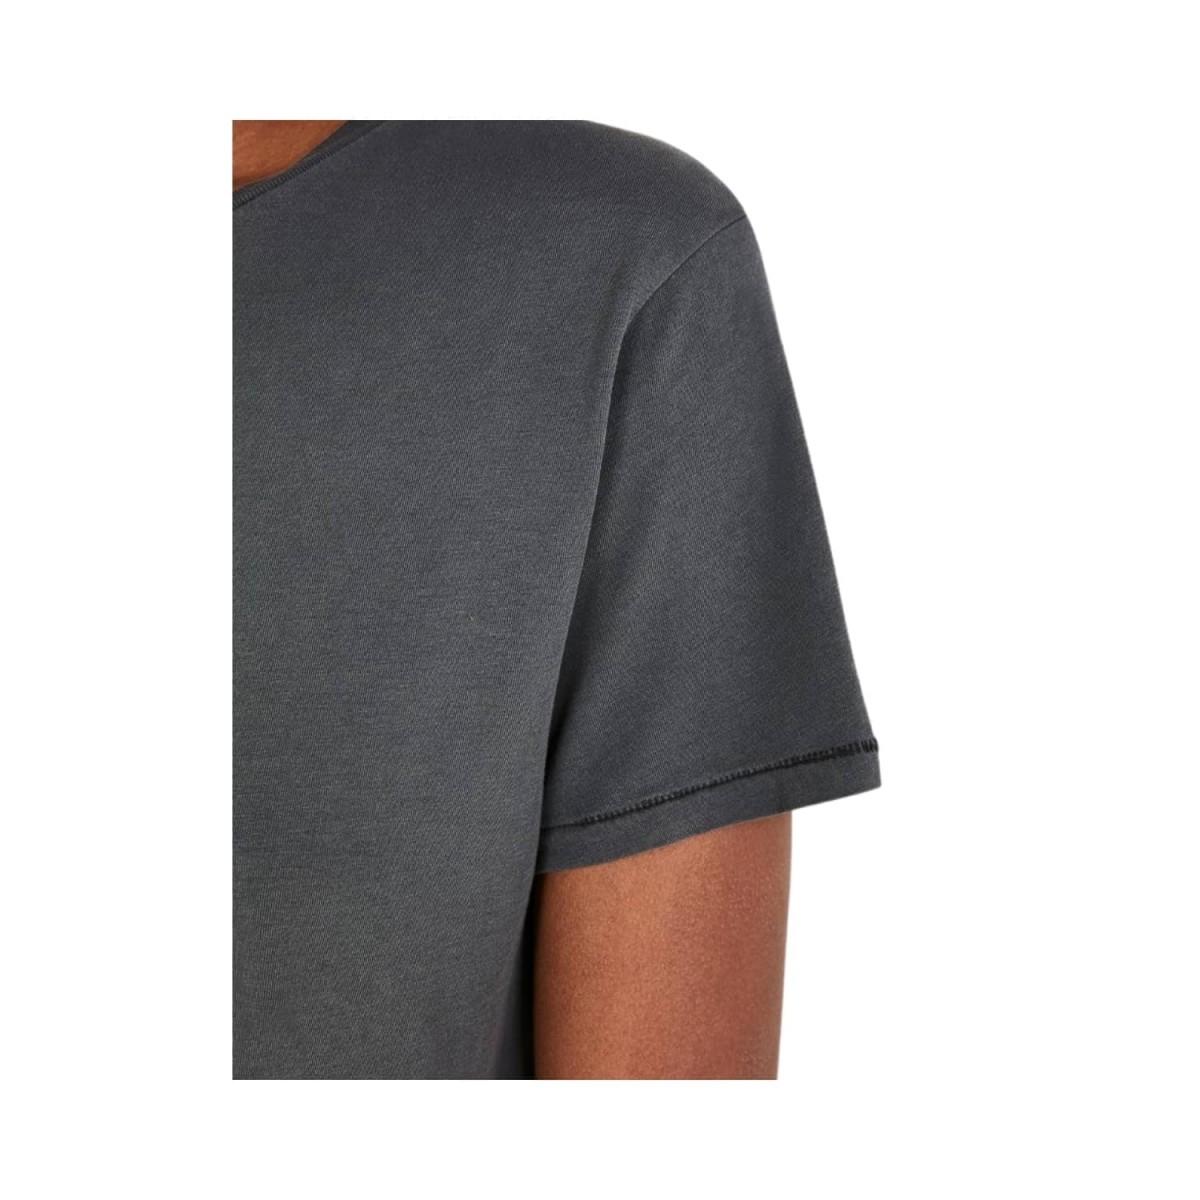 vegiflower t-shirt - metal - detalje billede